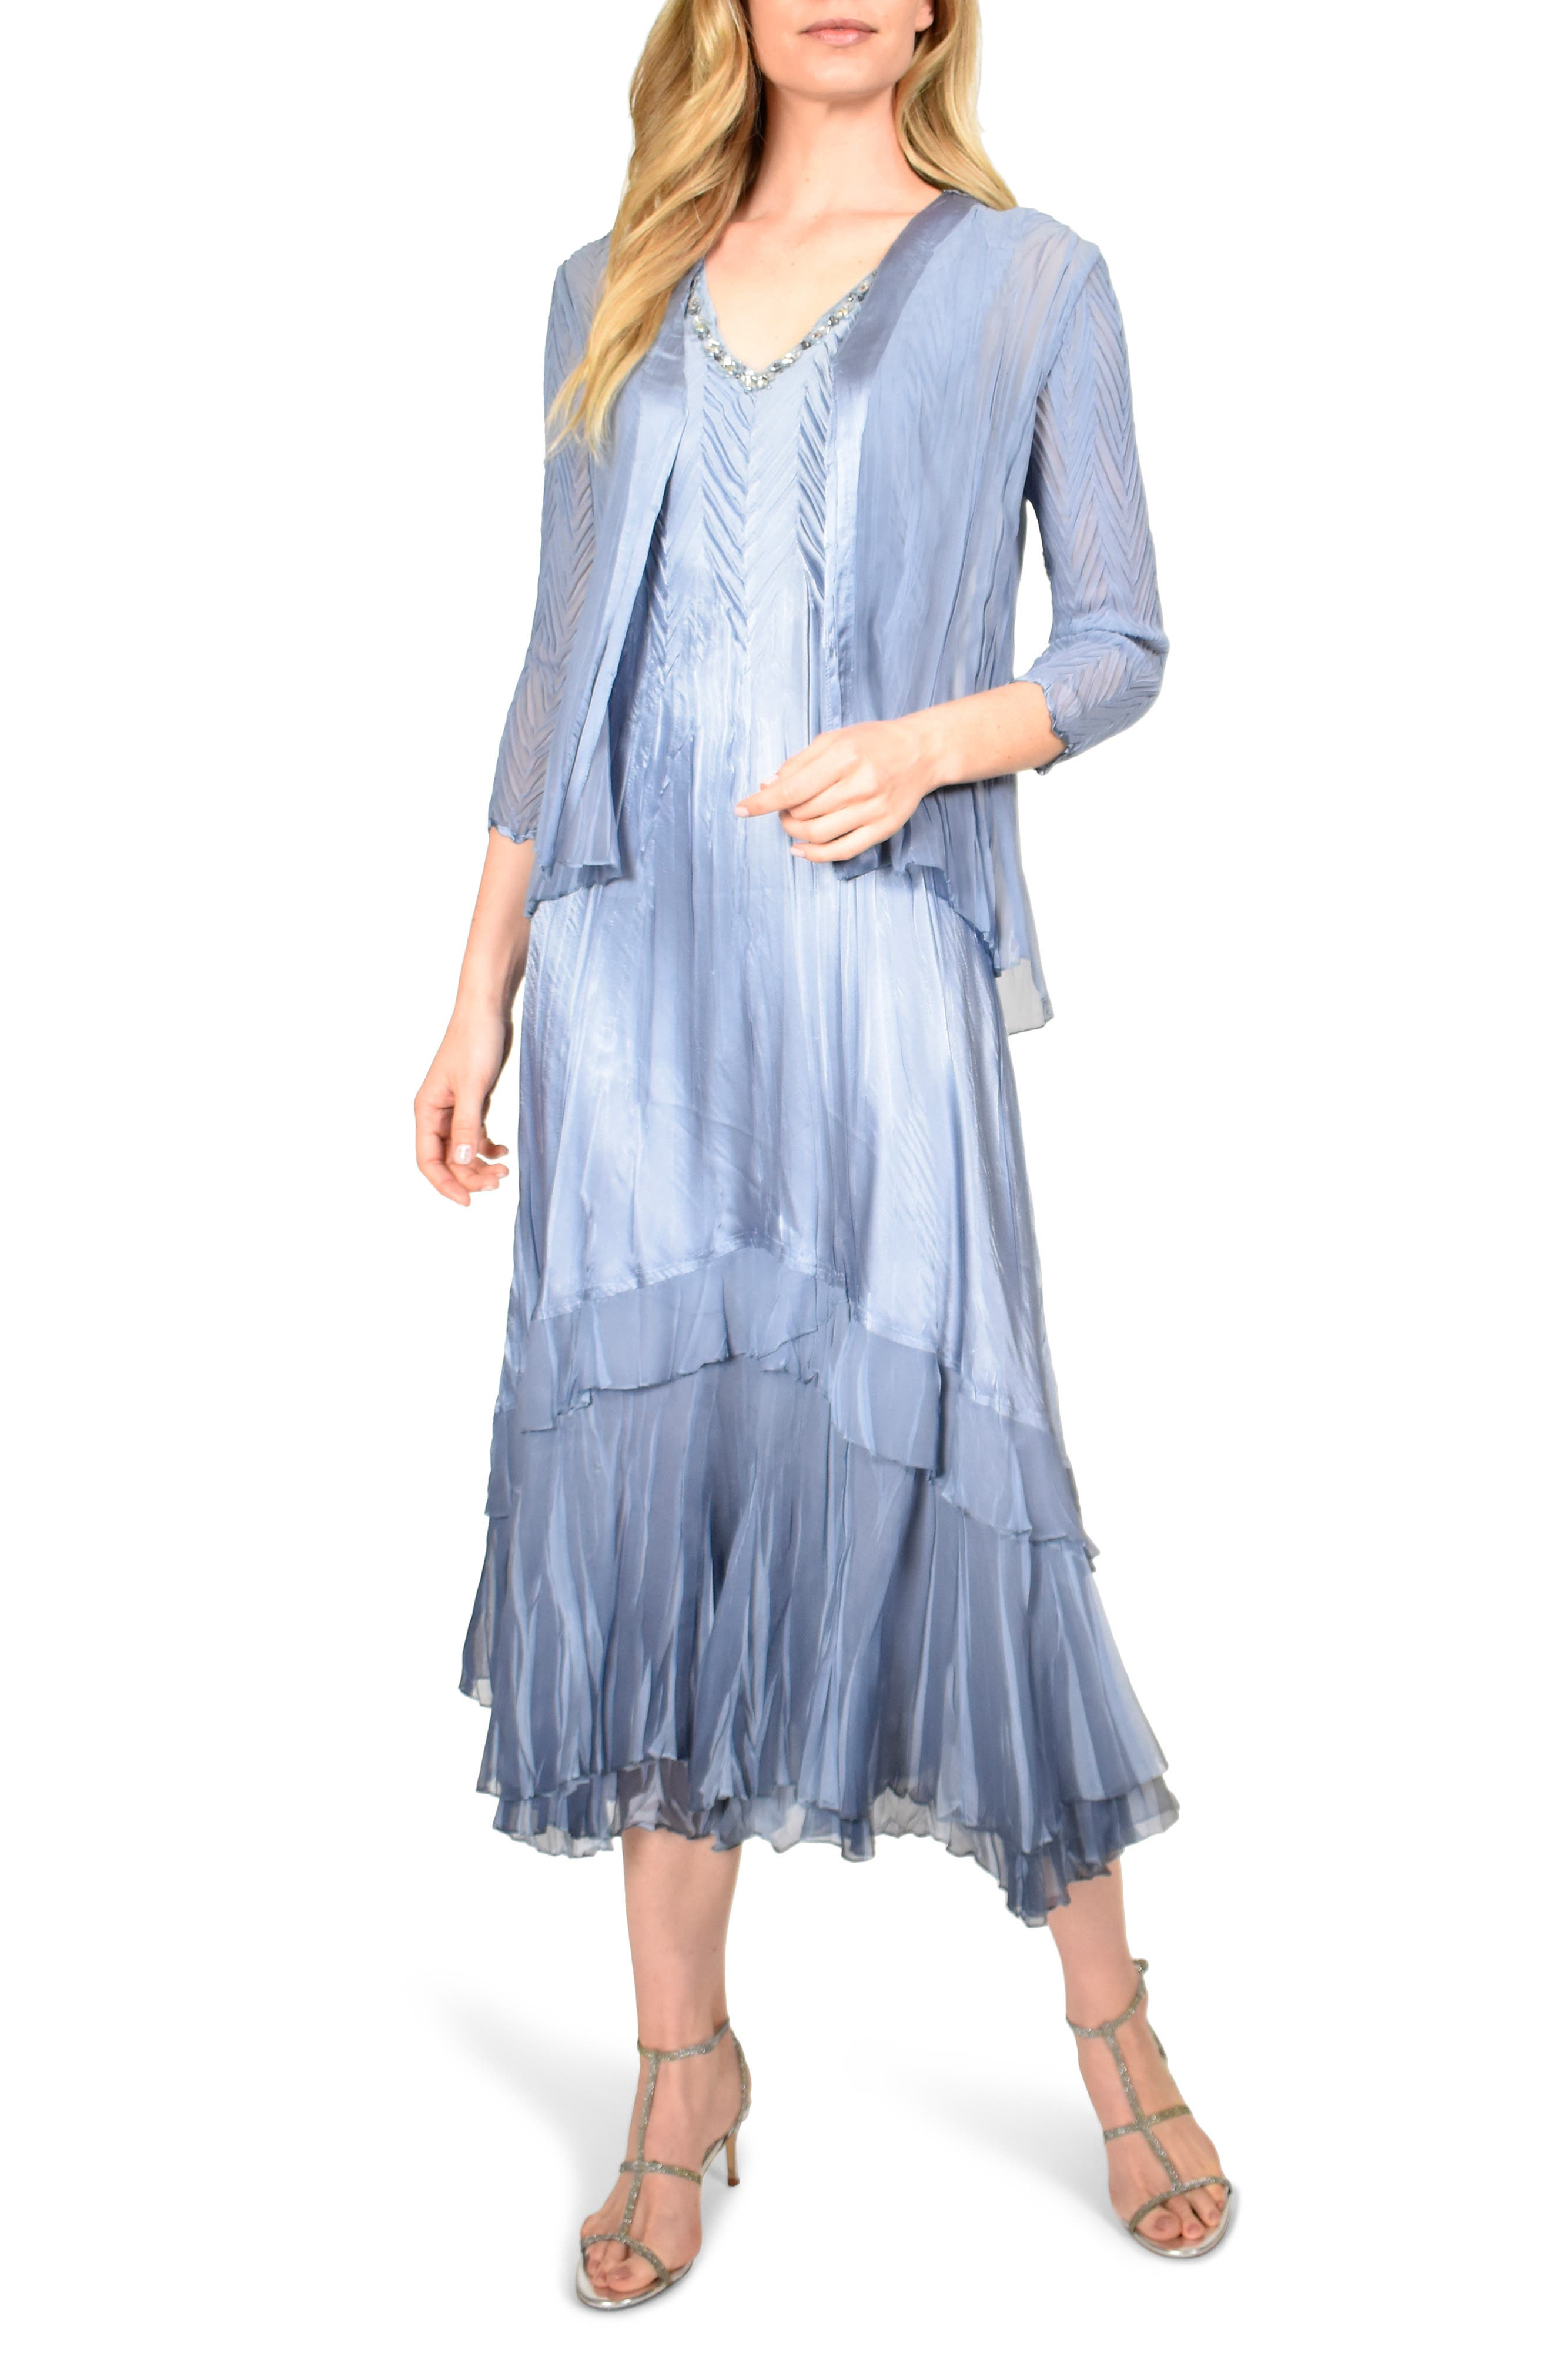 Vintage 1920s Dresses – Where to Buy Womens Komarov Beaded Neck Charmeuse Midi Dress With Chiffon Jacket $458.00 AT vintagedancer.com